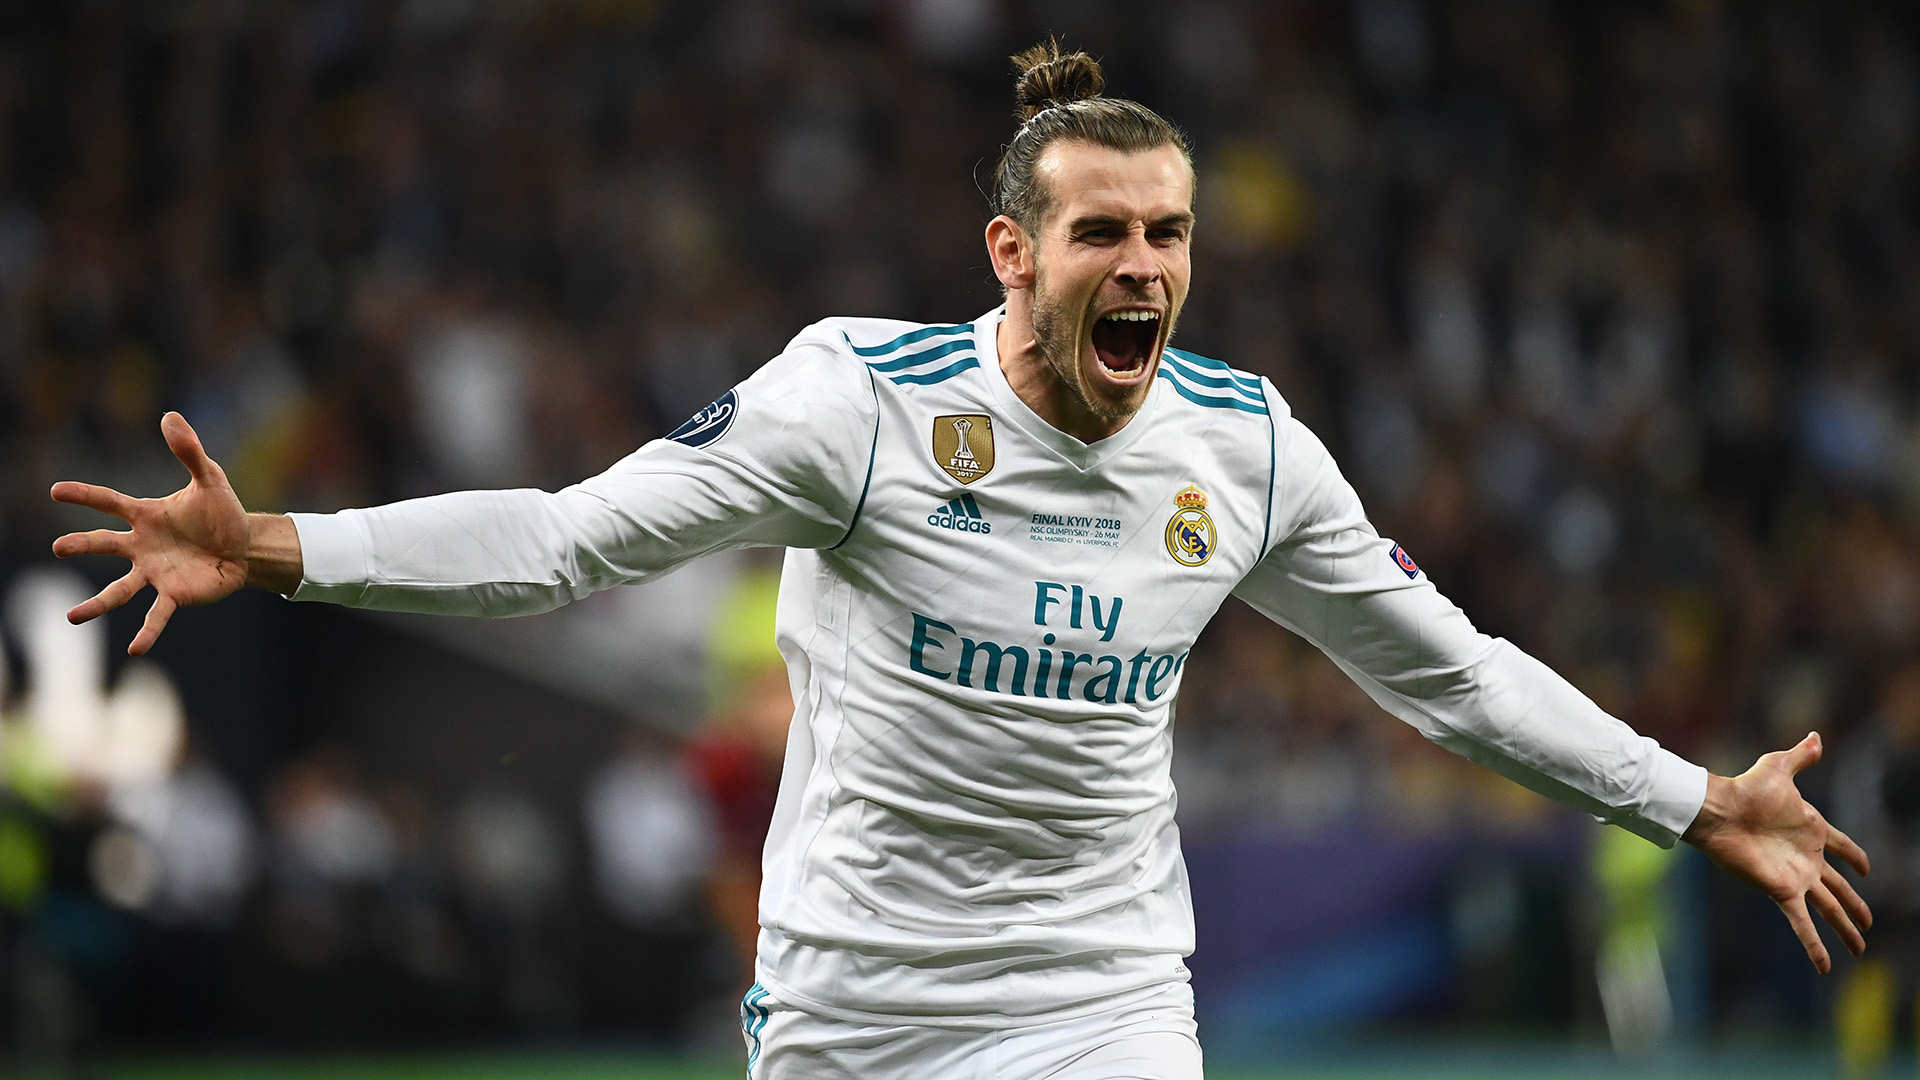 Gareth Bale Real Madrid Liverpool Champions League final 260518